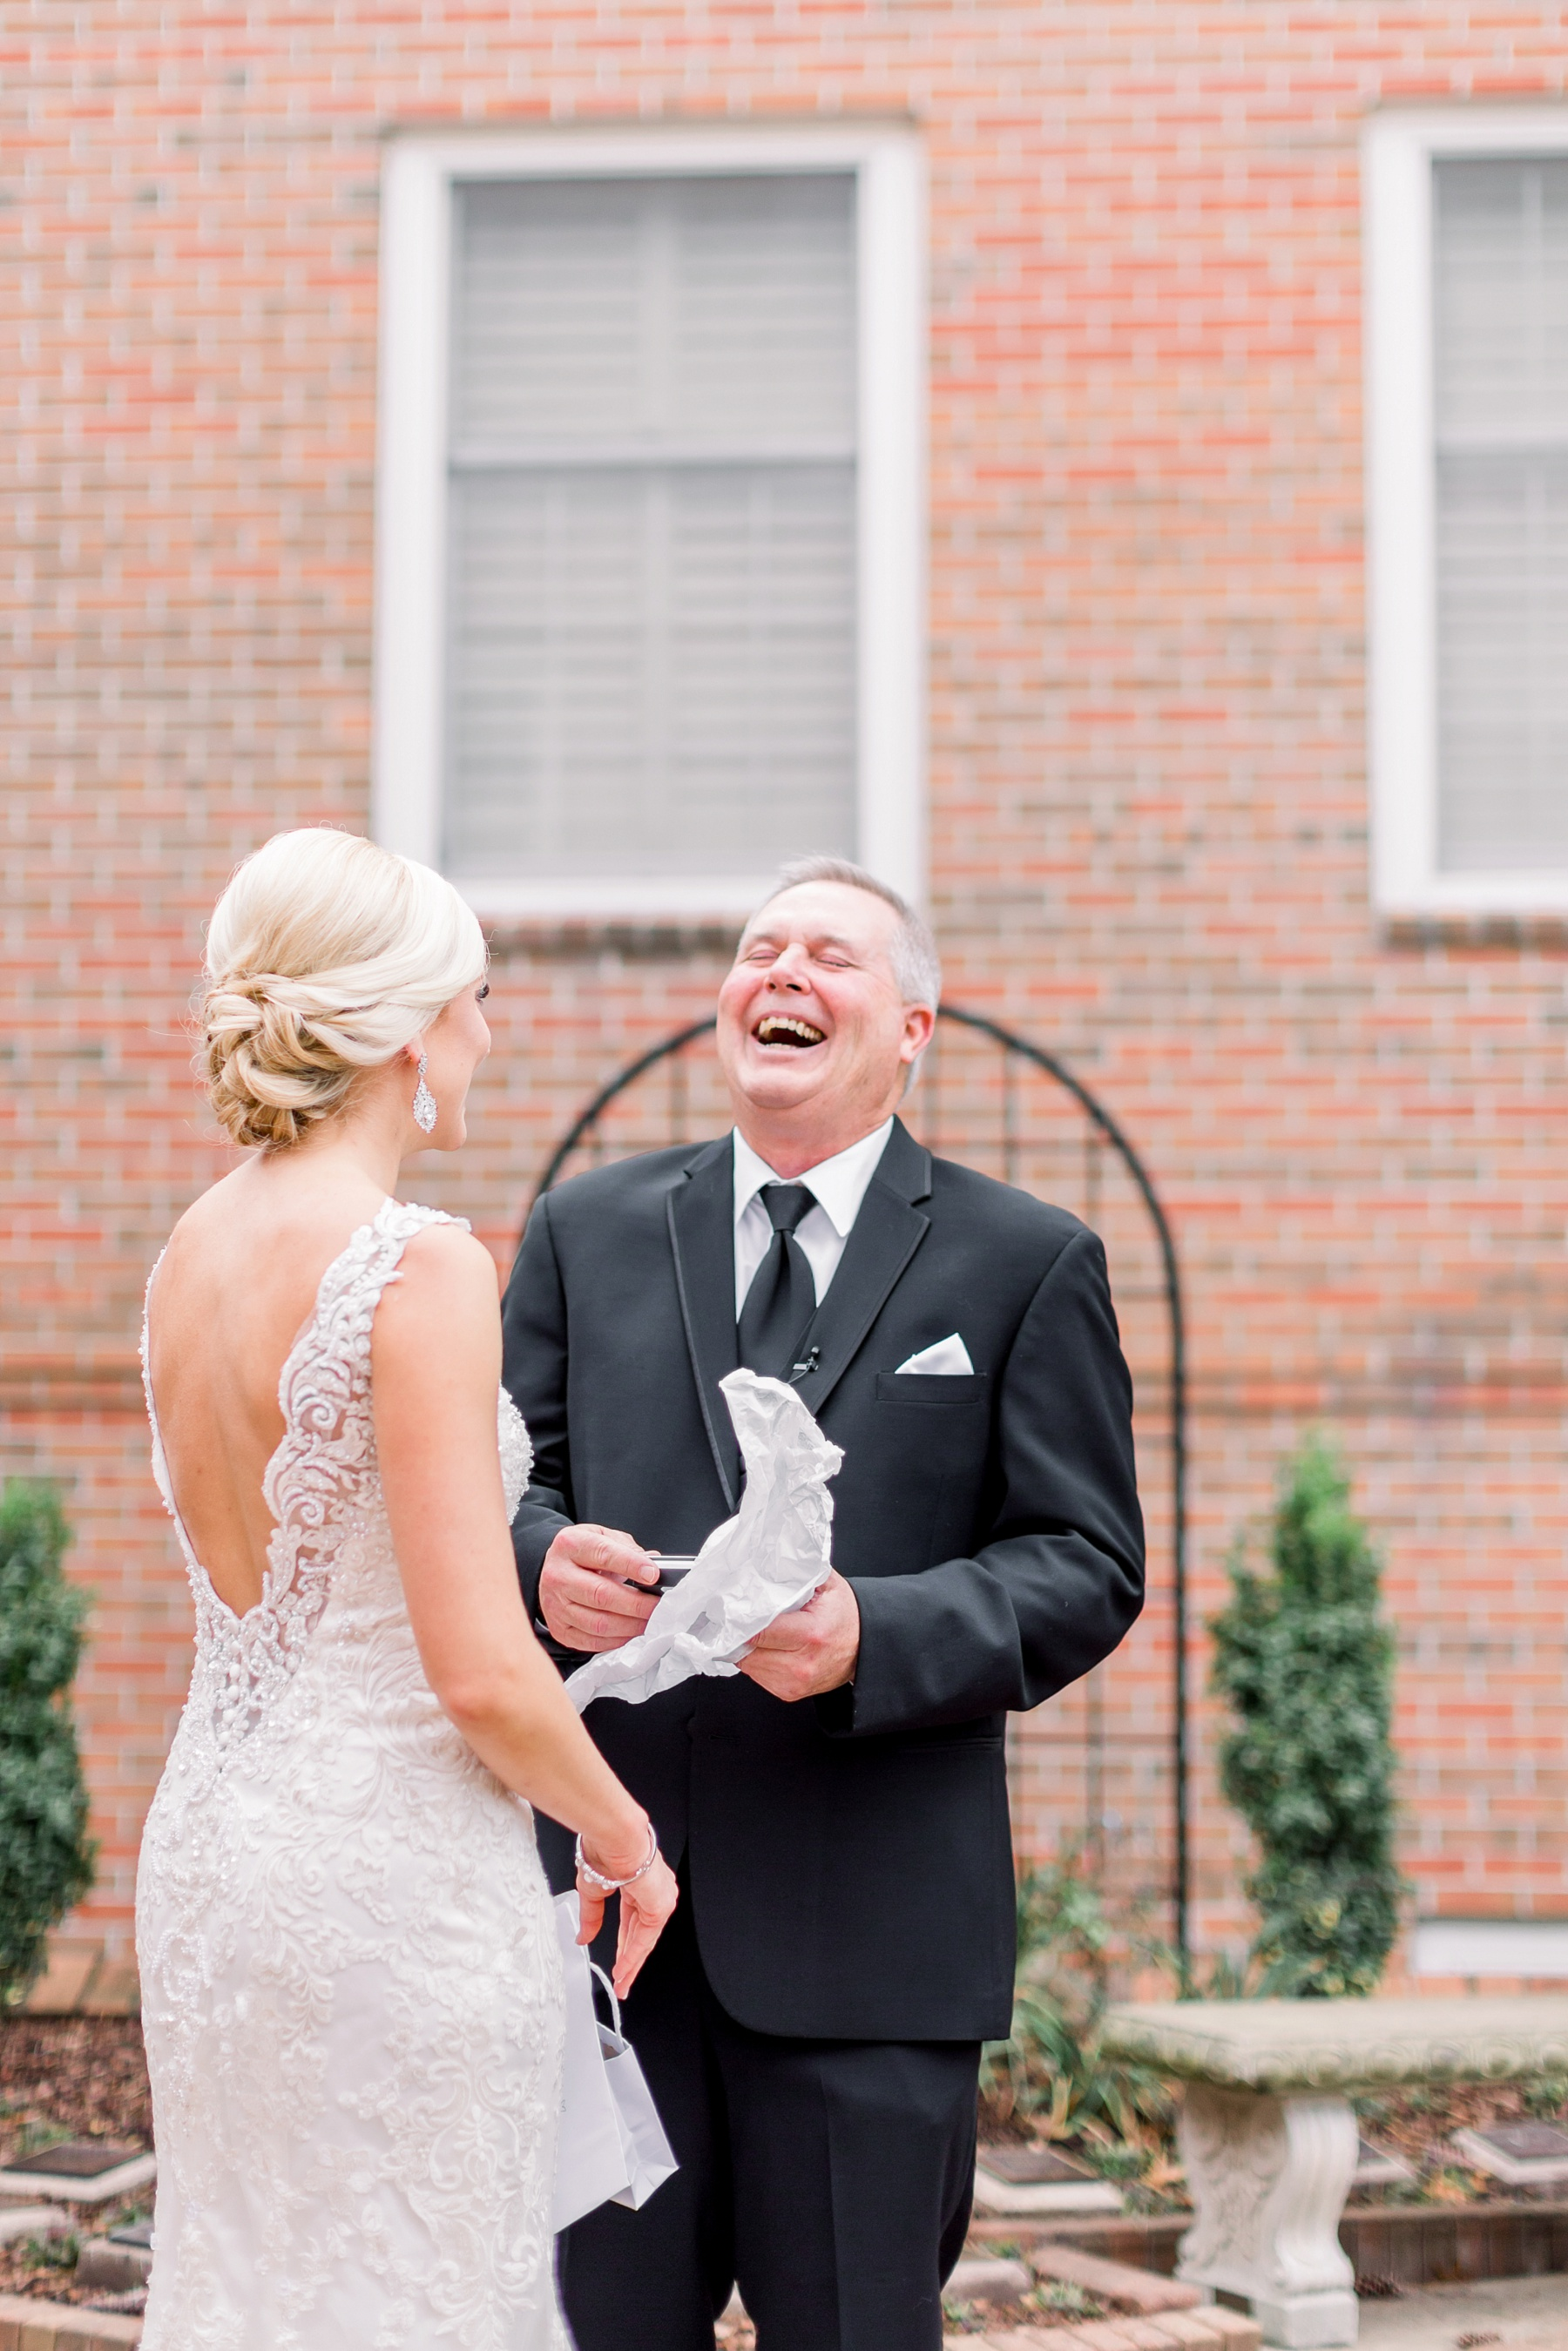 midwest-adventurous-wedding-photographer-elizabeth-ladean-photography-photo_4712.jpg